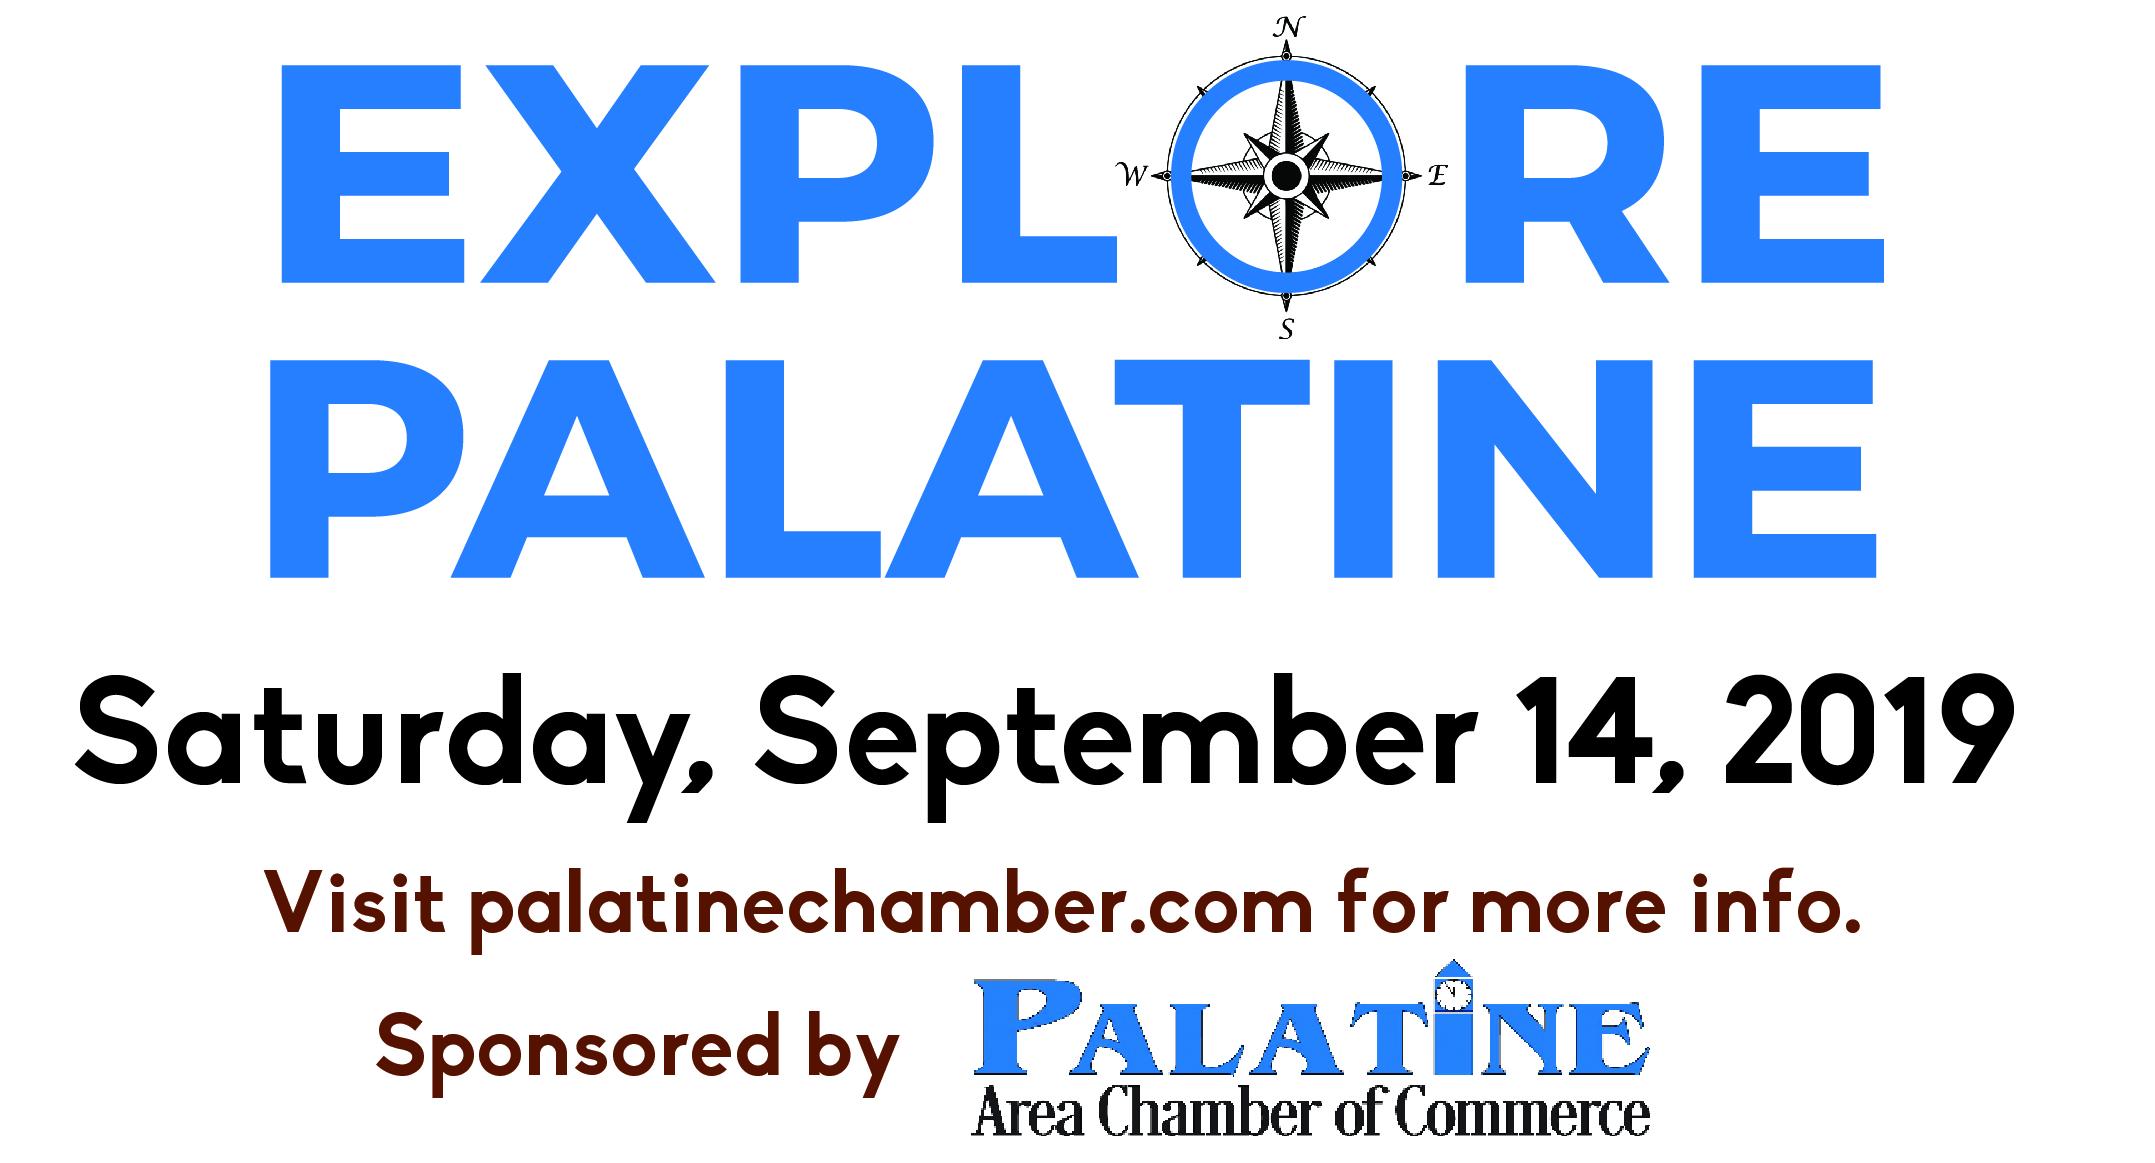 Explore-Palatine2019-img.jpg